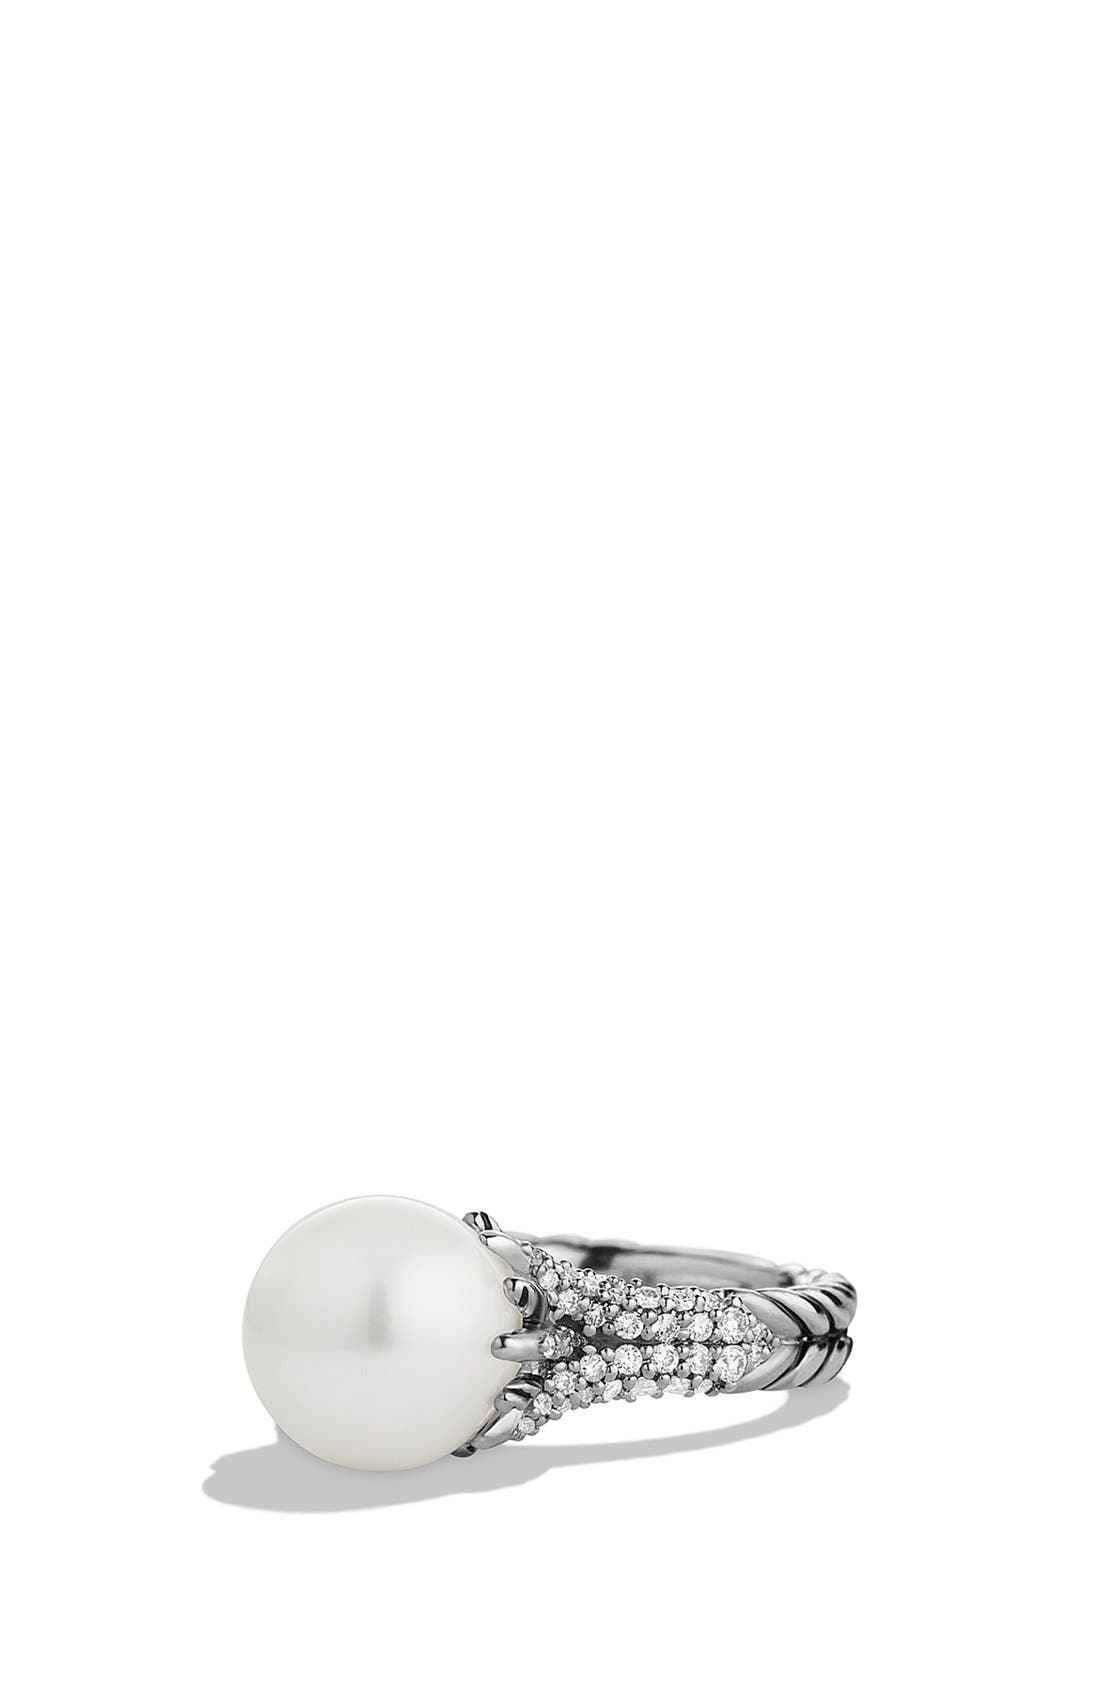 Main Image - David Yurman 'Starburst' Pearl Ring with Diamonds